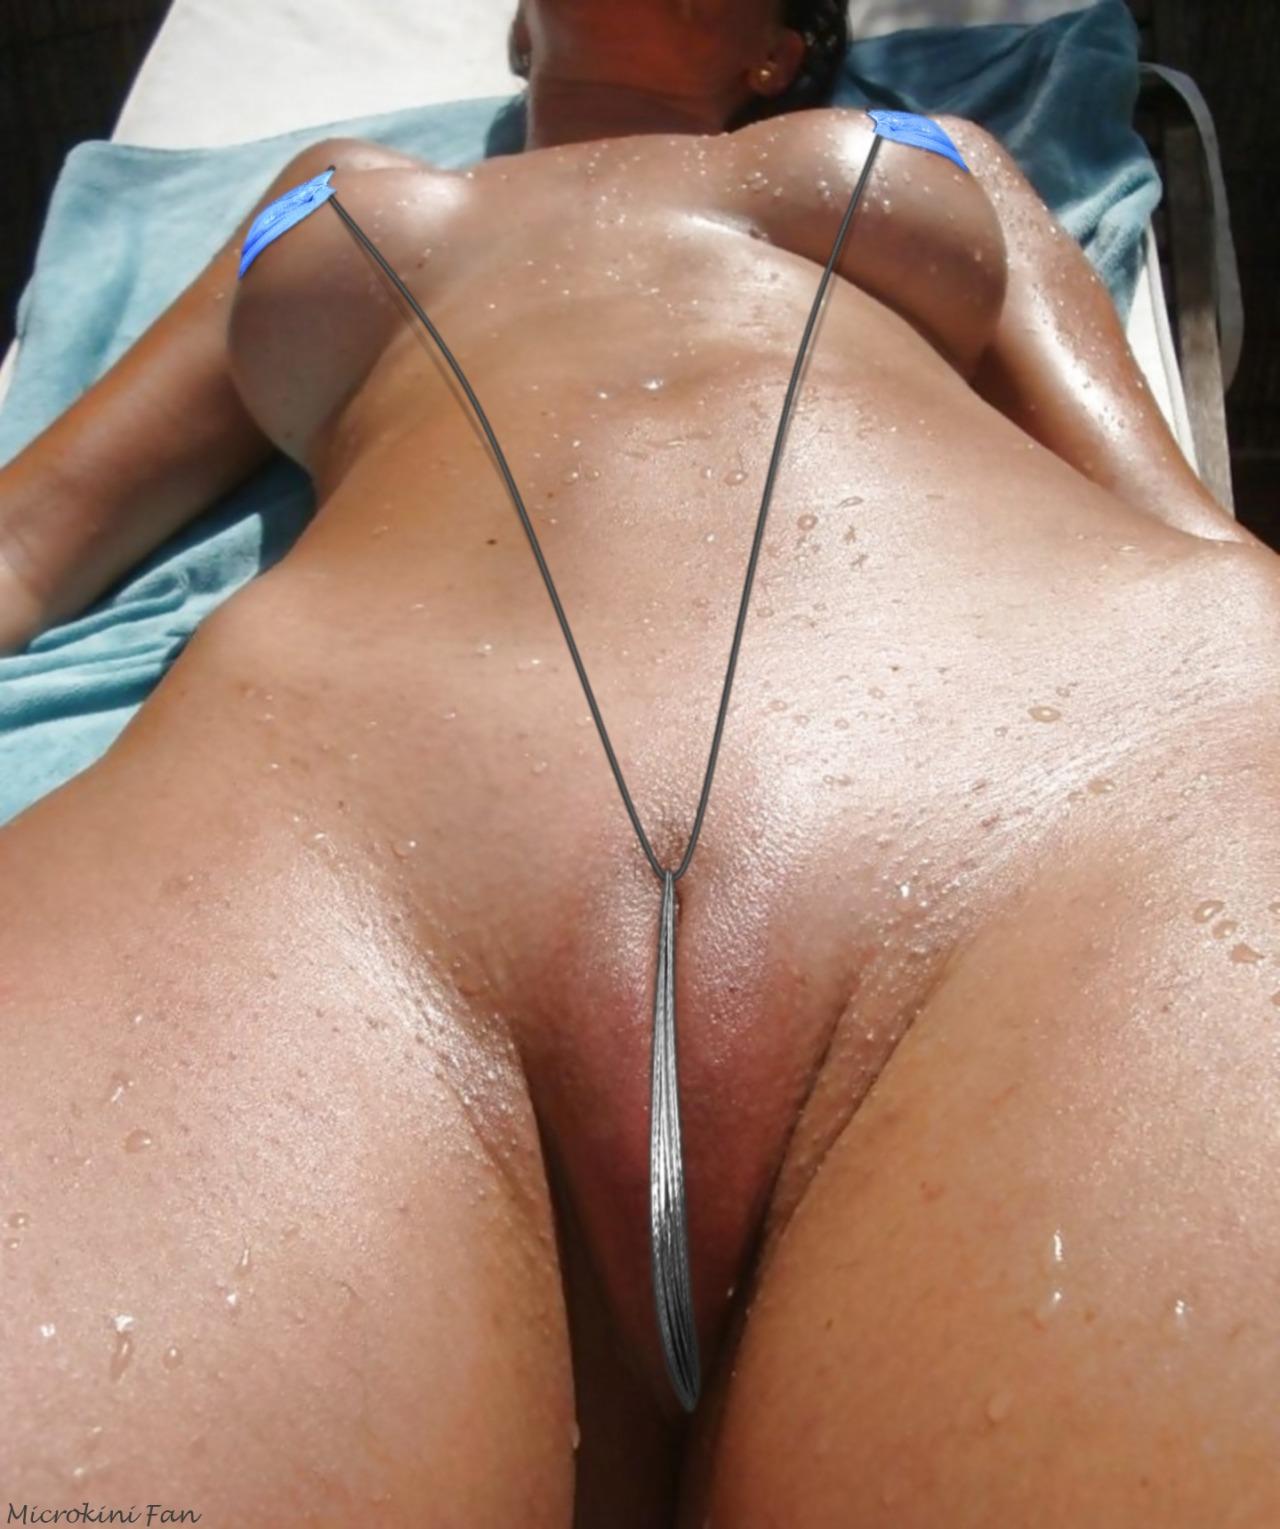 Bikini girl at airport